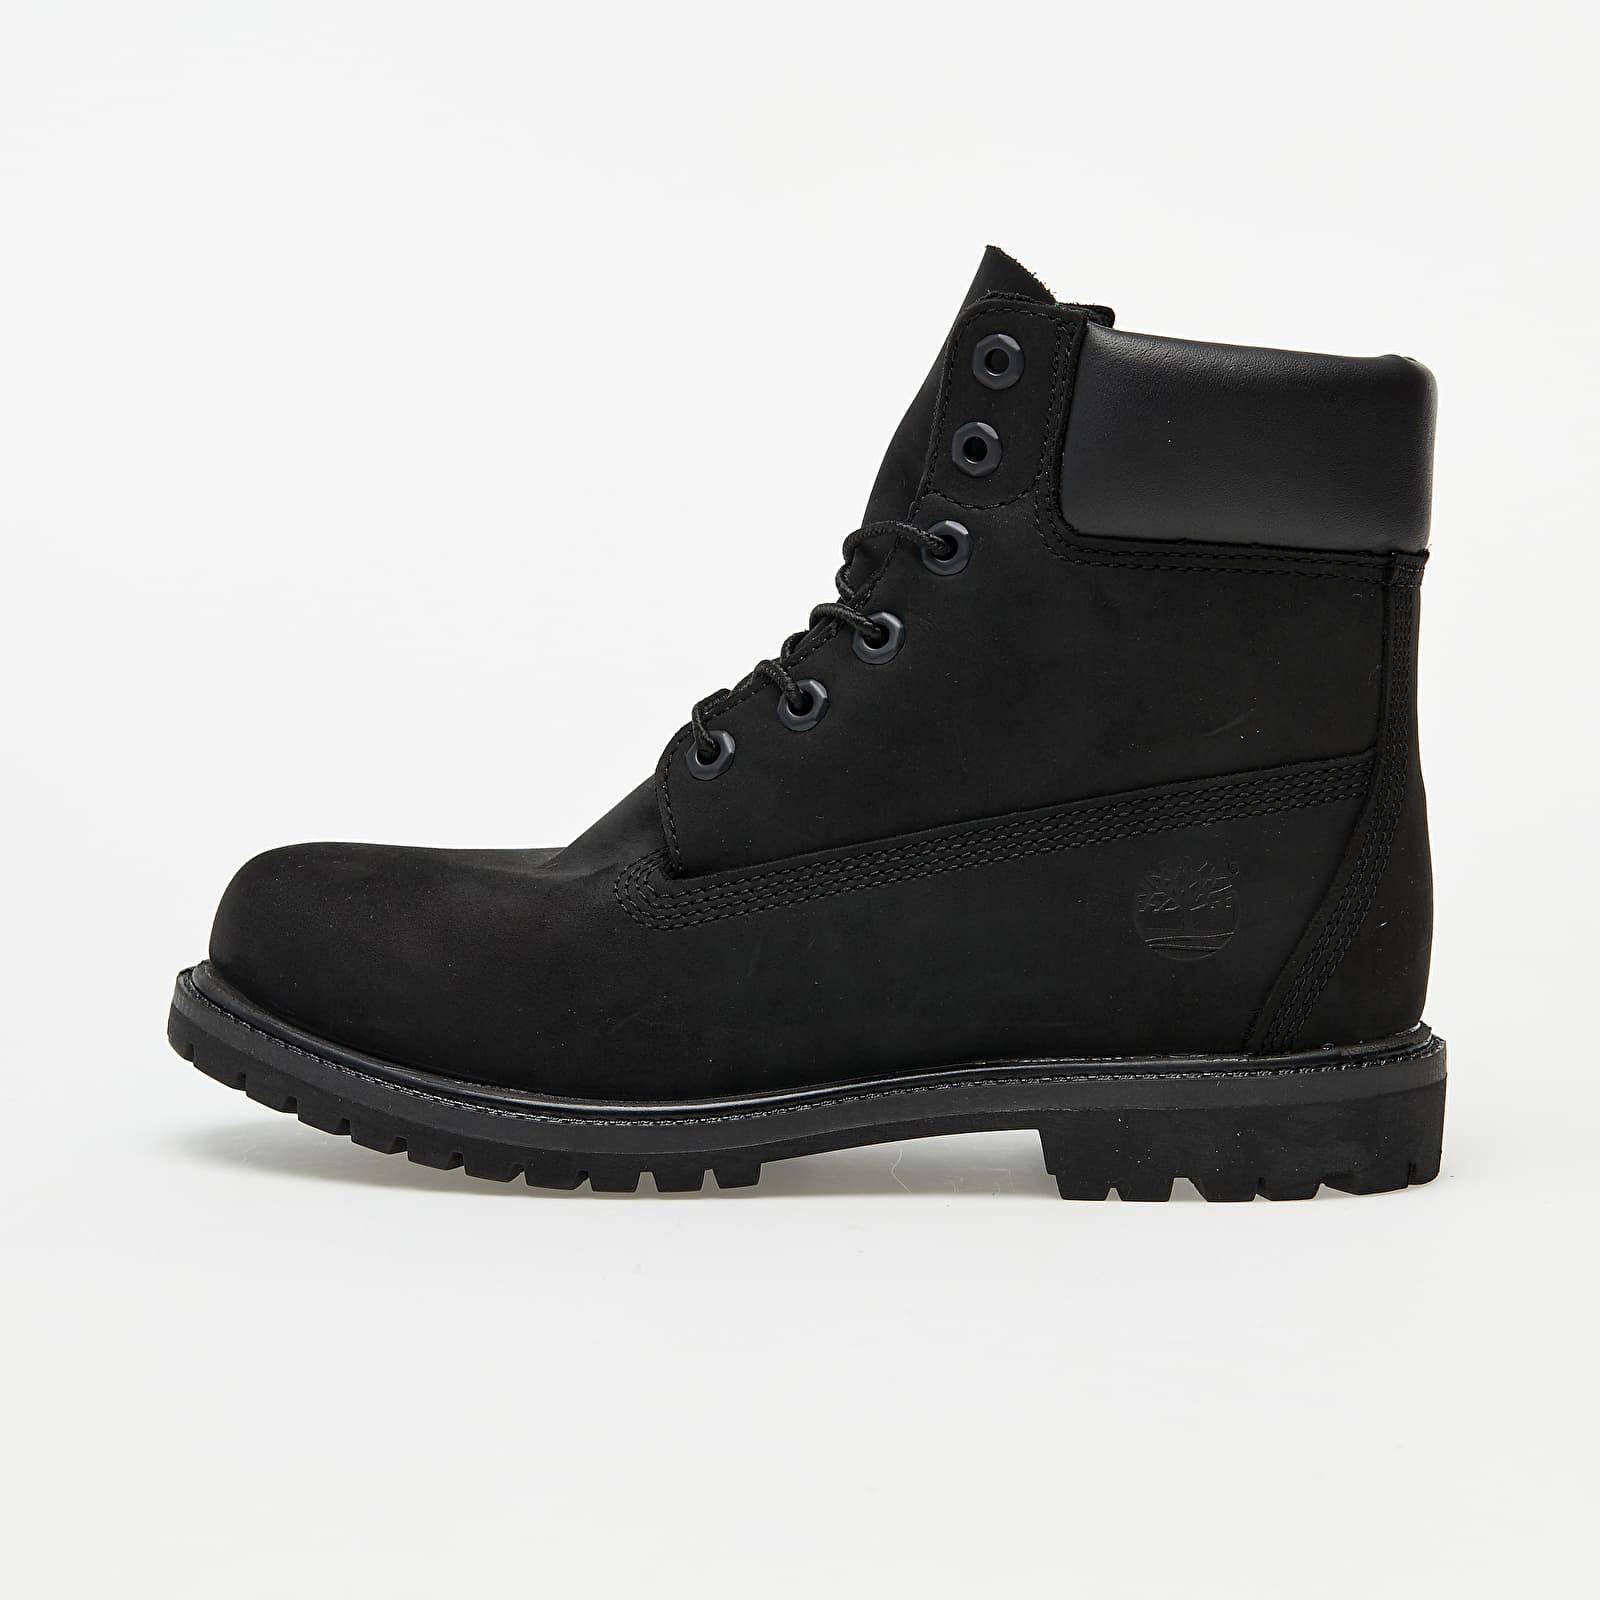 Chaussures et baskets femme Timberland Premium 6 In Waterproof Boot Black